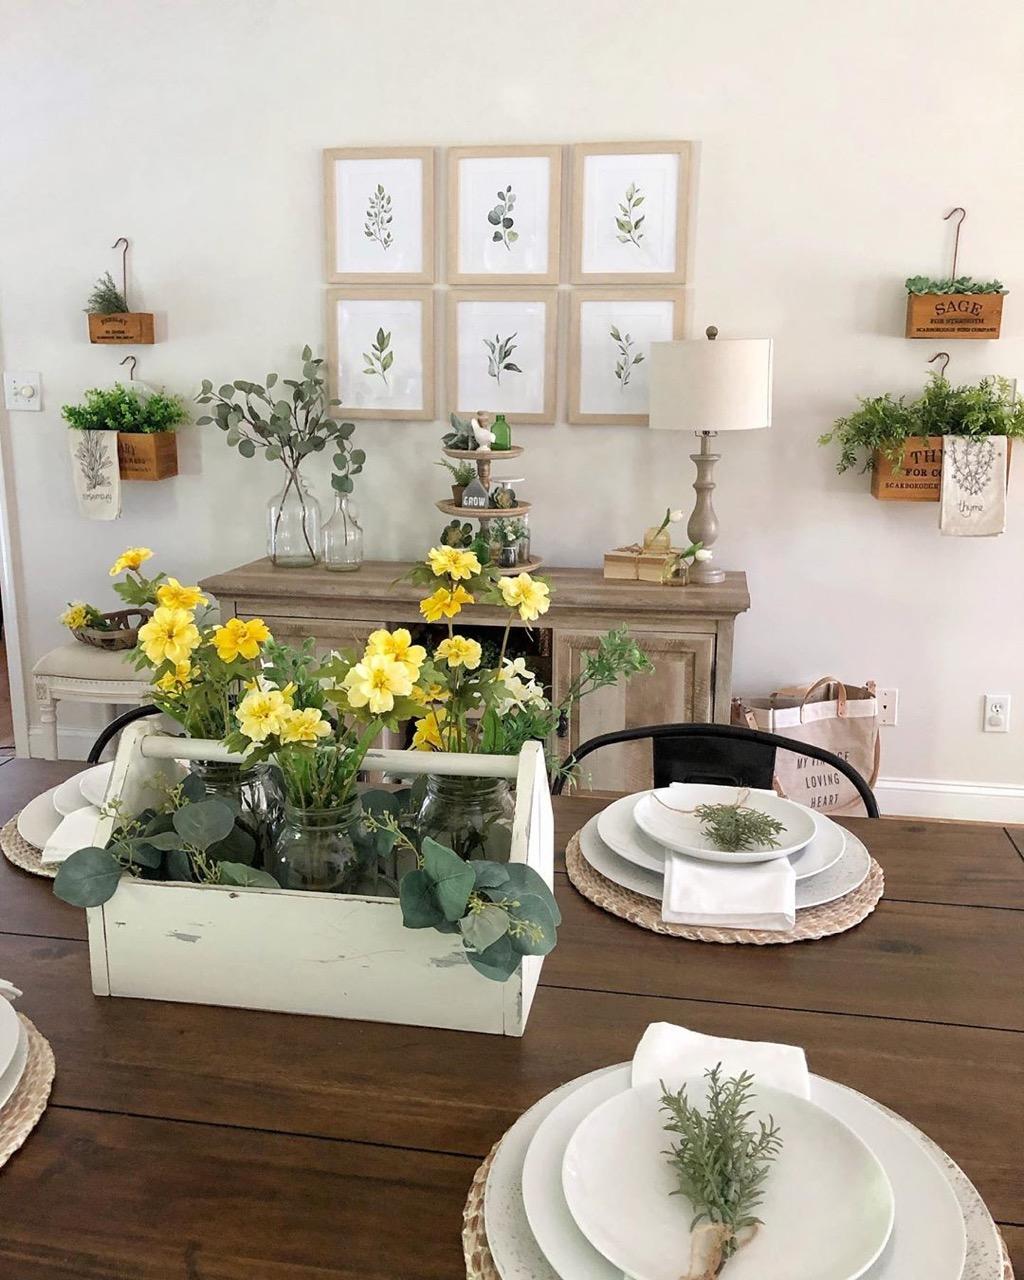 Illustration of flowers for kitchen decor